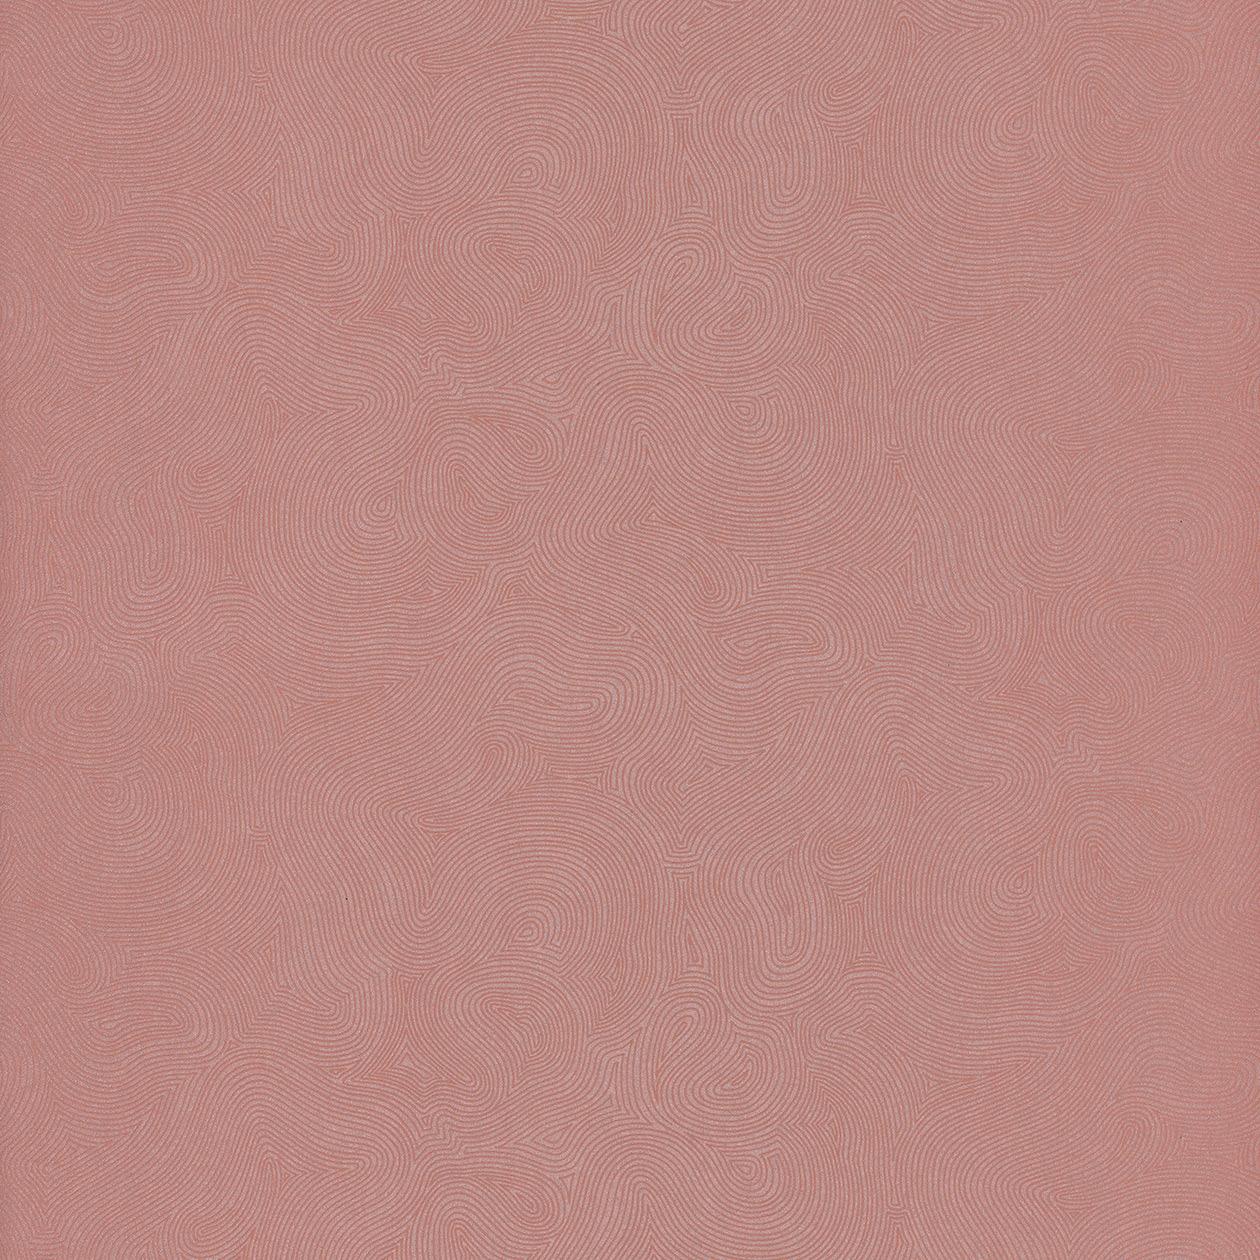 Французские обои Caselio,  коллекция Trio, артикулTIO68023066